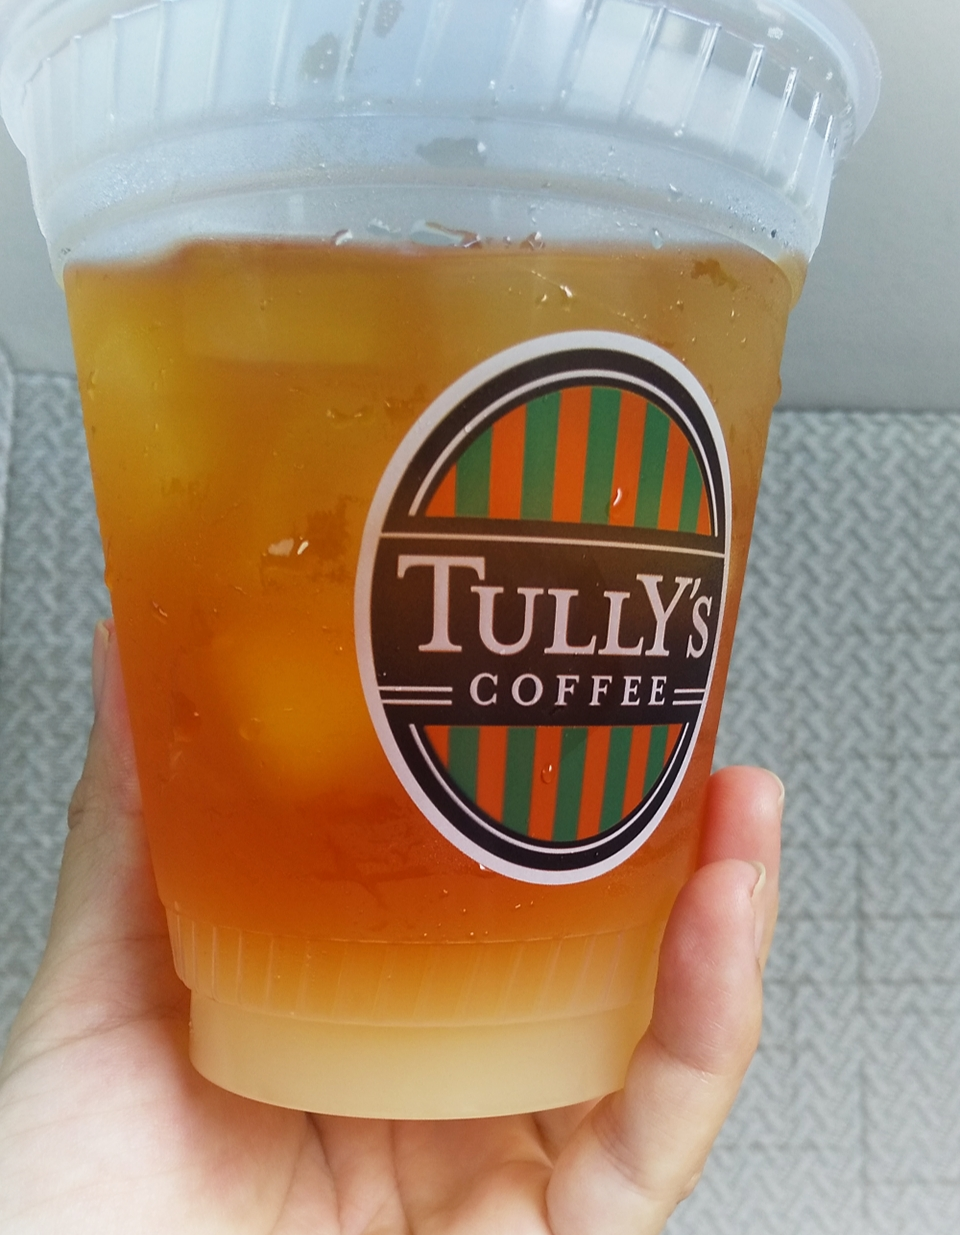 TULLY'S COFFEE【5/19発売 暑い日にぴったり】グレープフルーツの贅沢な果肉の大きさに驚き!!_2